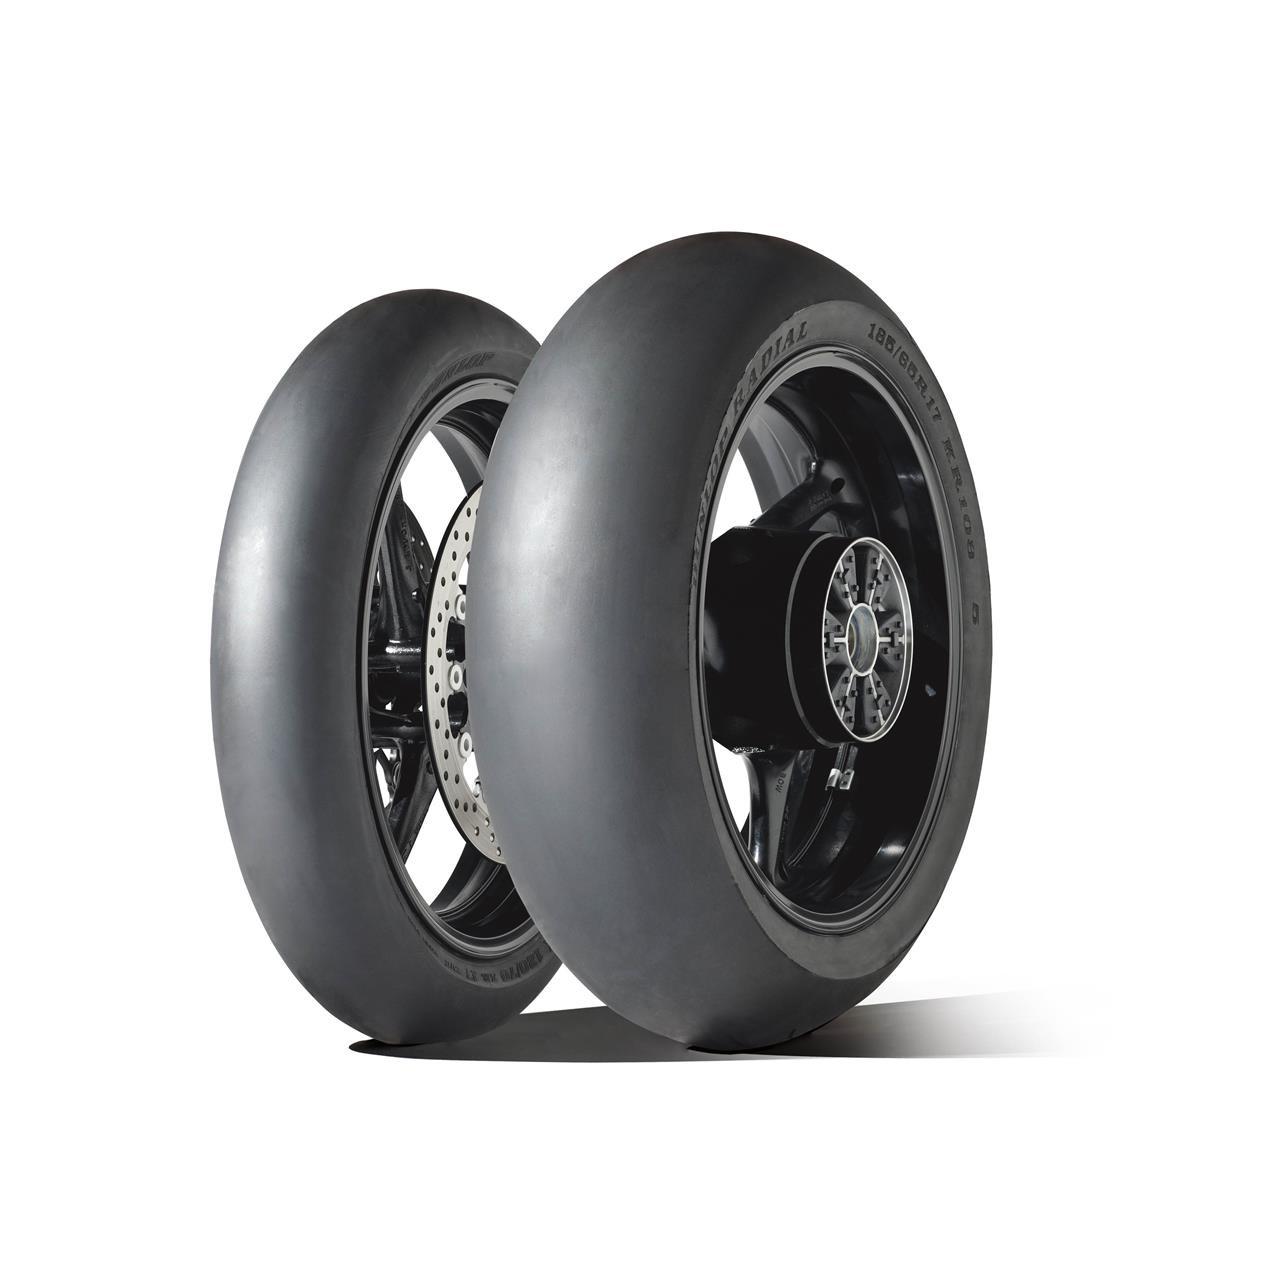 Dunlop tops magazine test of slick motorcycle tyres